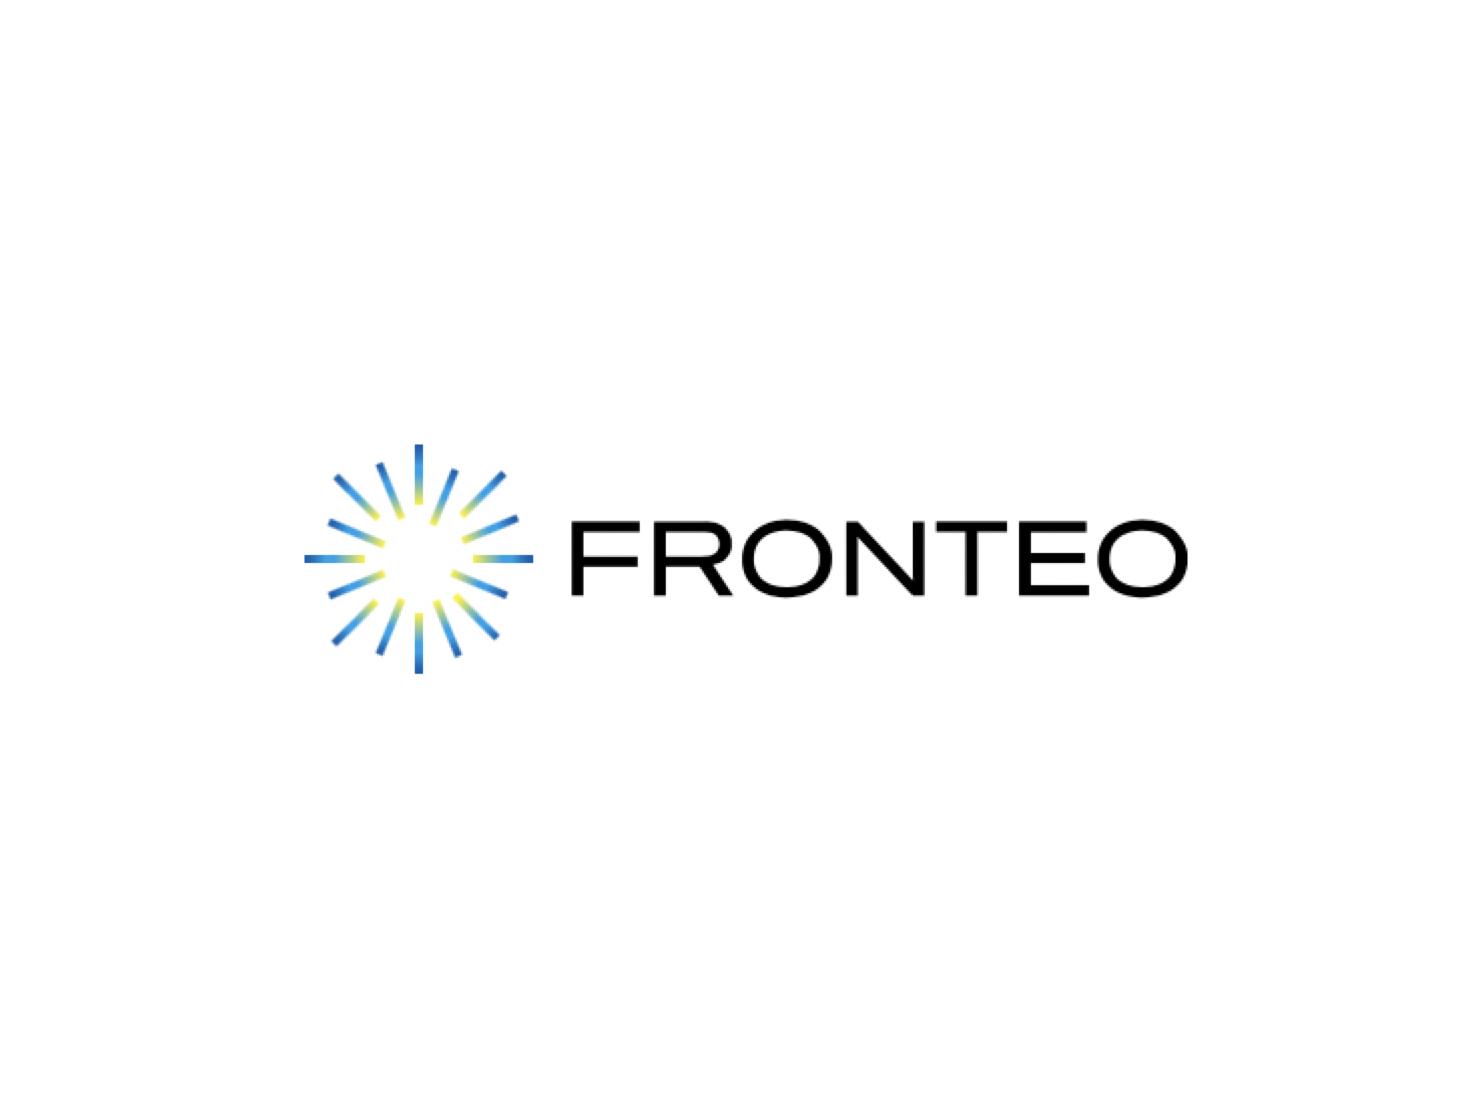 FRONTEO、米国でAIレビューツール「KIBIT Automator」の実証実験を実施